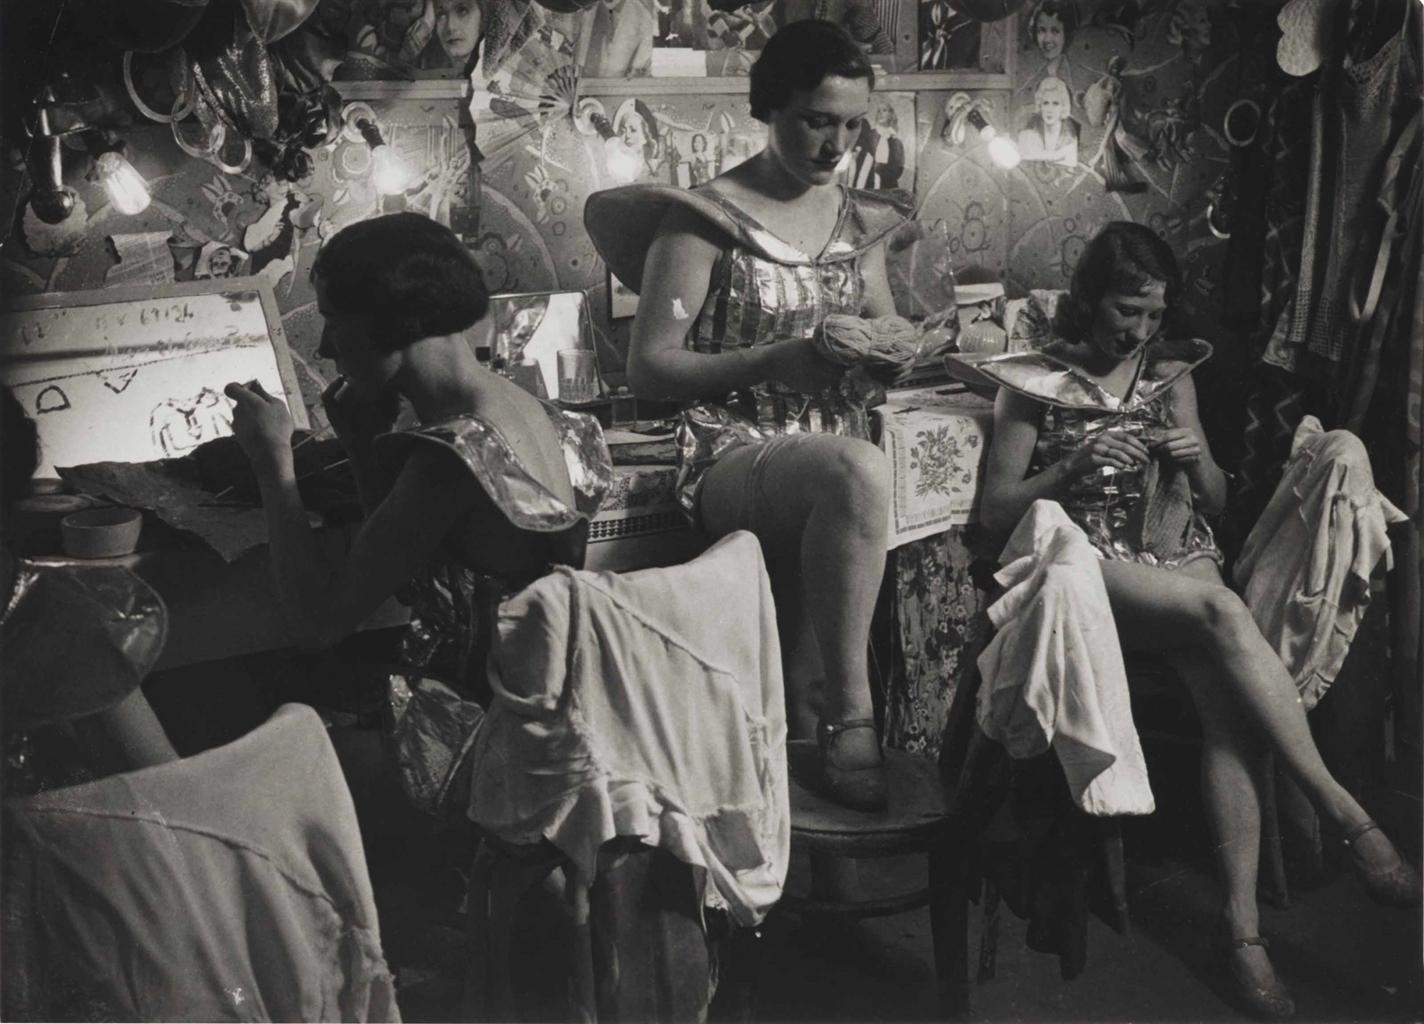 Brassai-Dressing Room At The Folies Bergere-1932